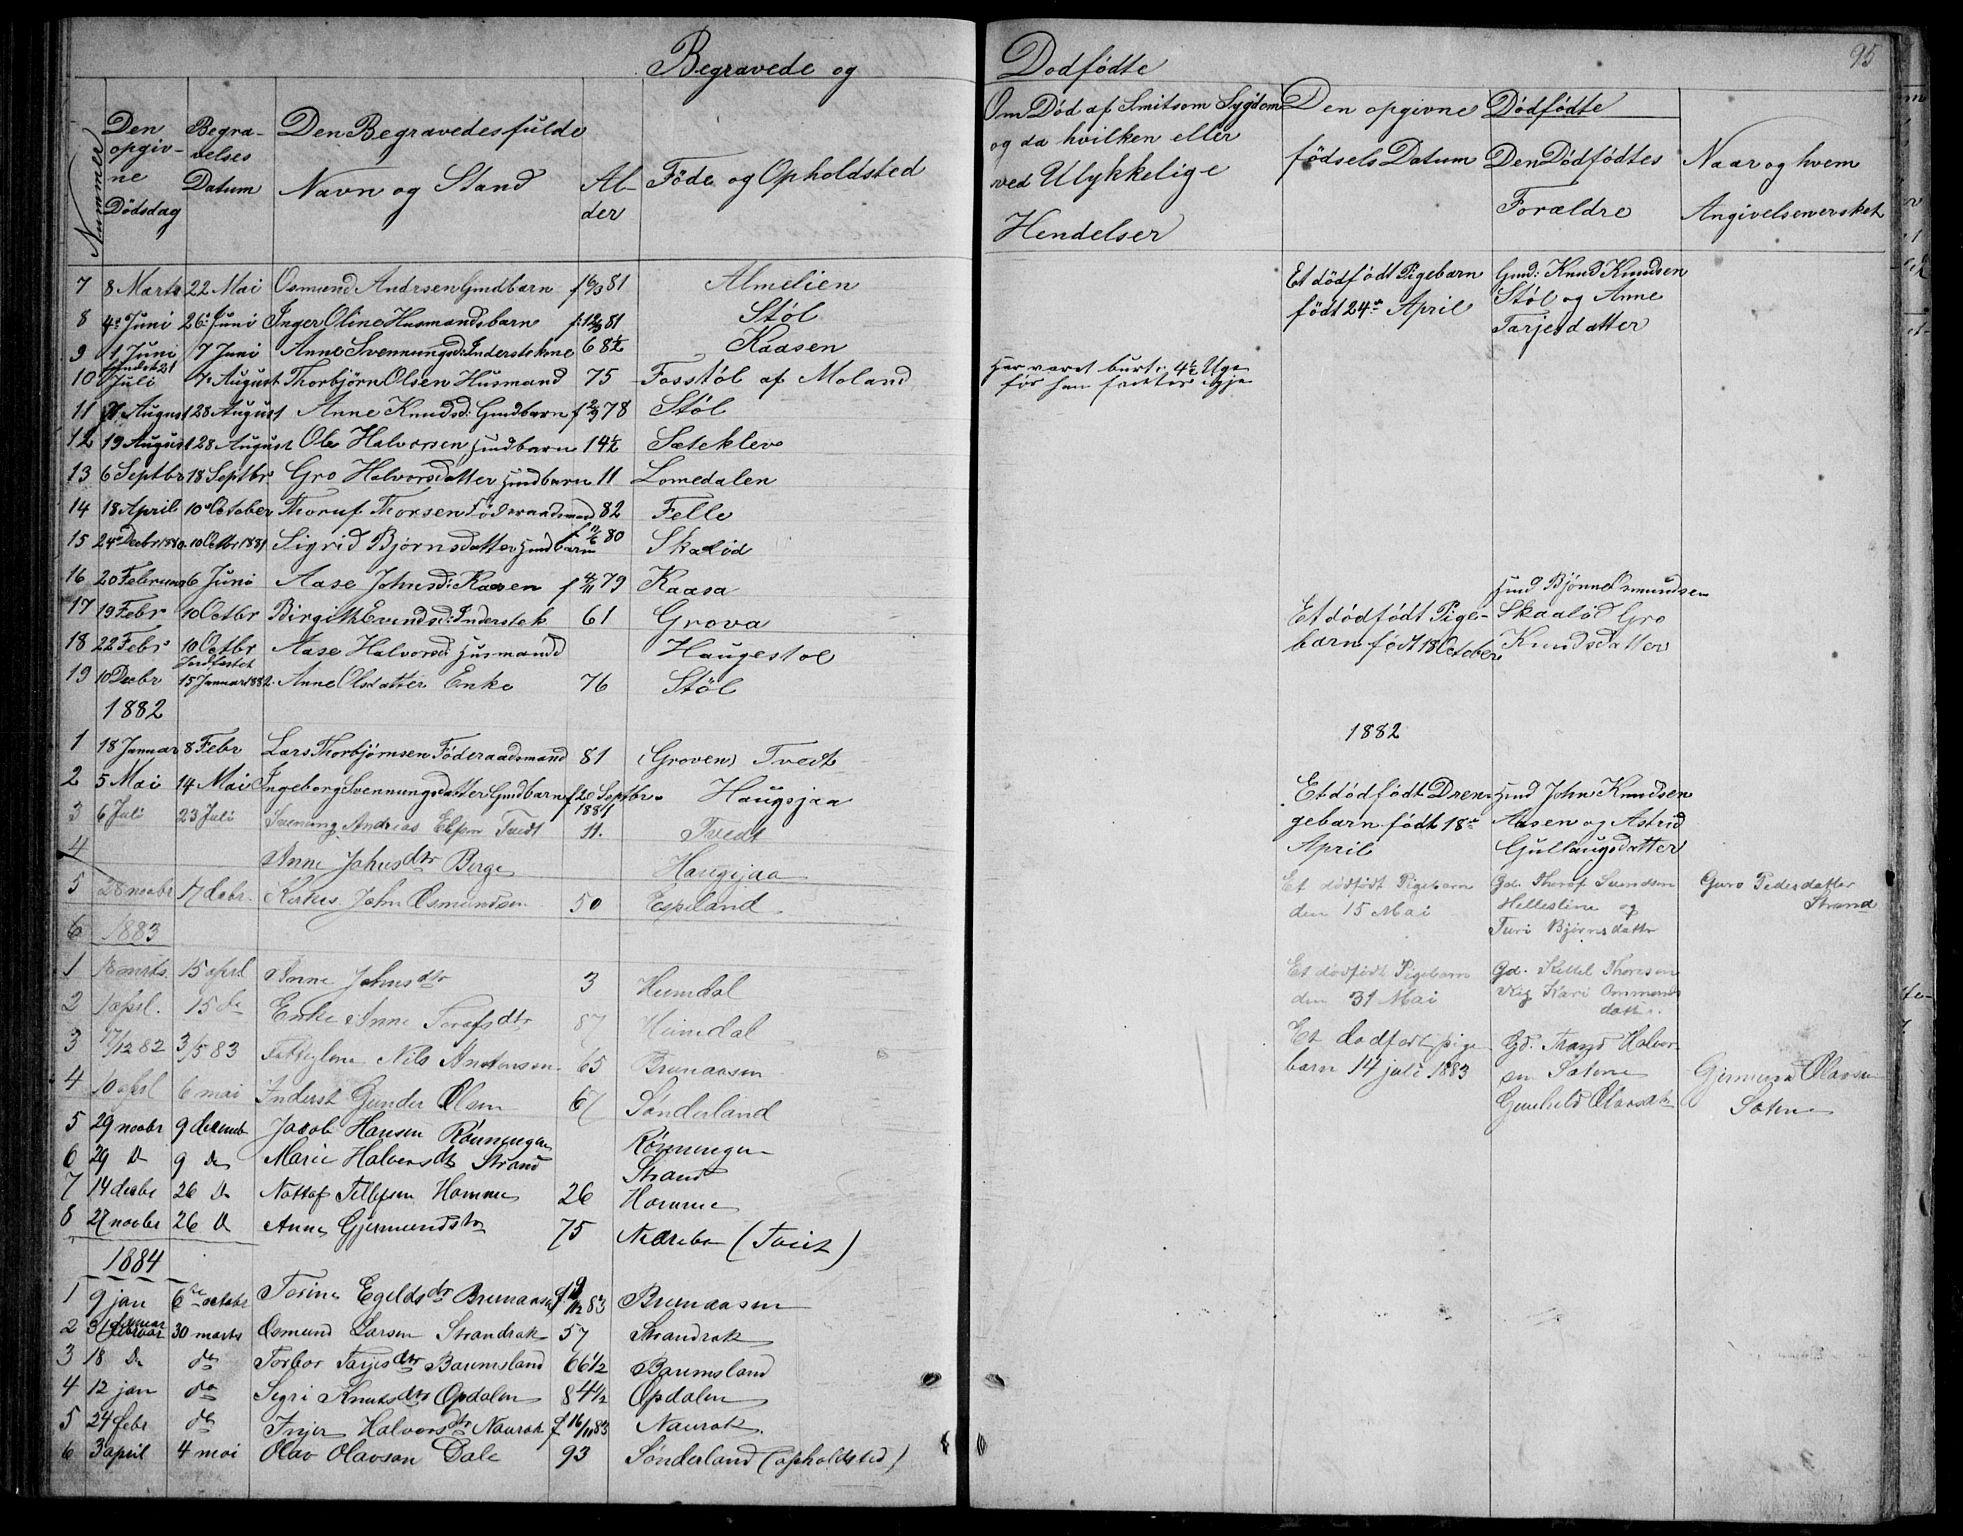 SAKO, Nissedal kirkebøker, G/Gb/L0002: Klokkerbok nr. II 2, 1863-1892, s. 95